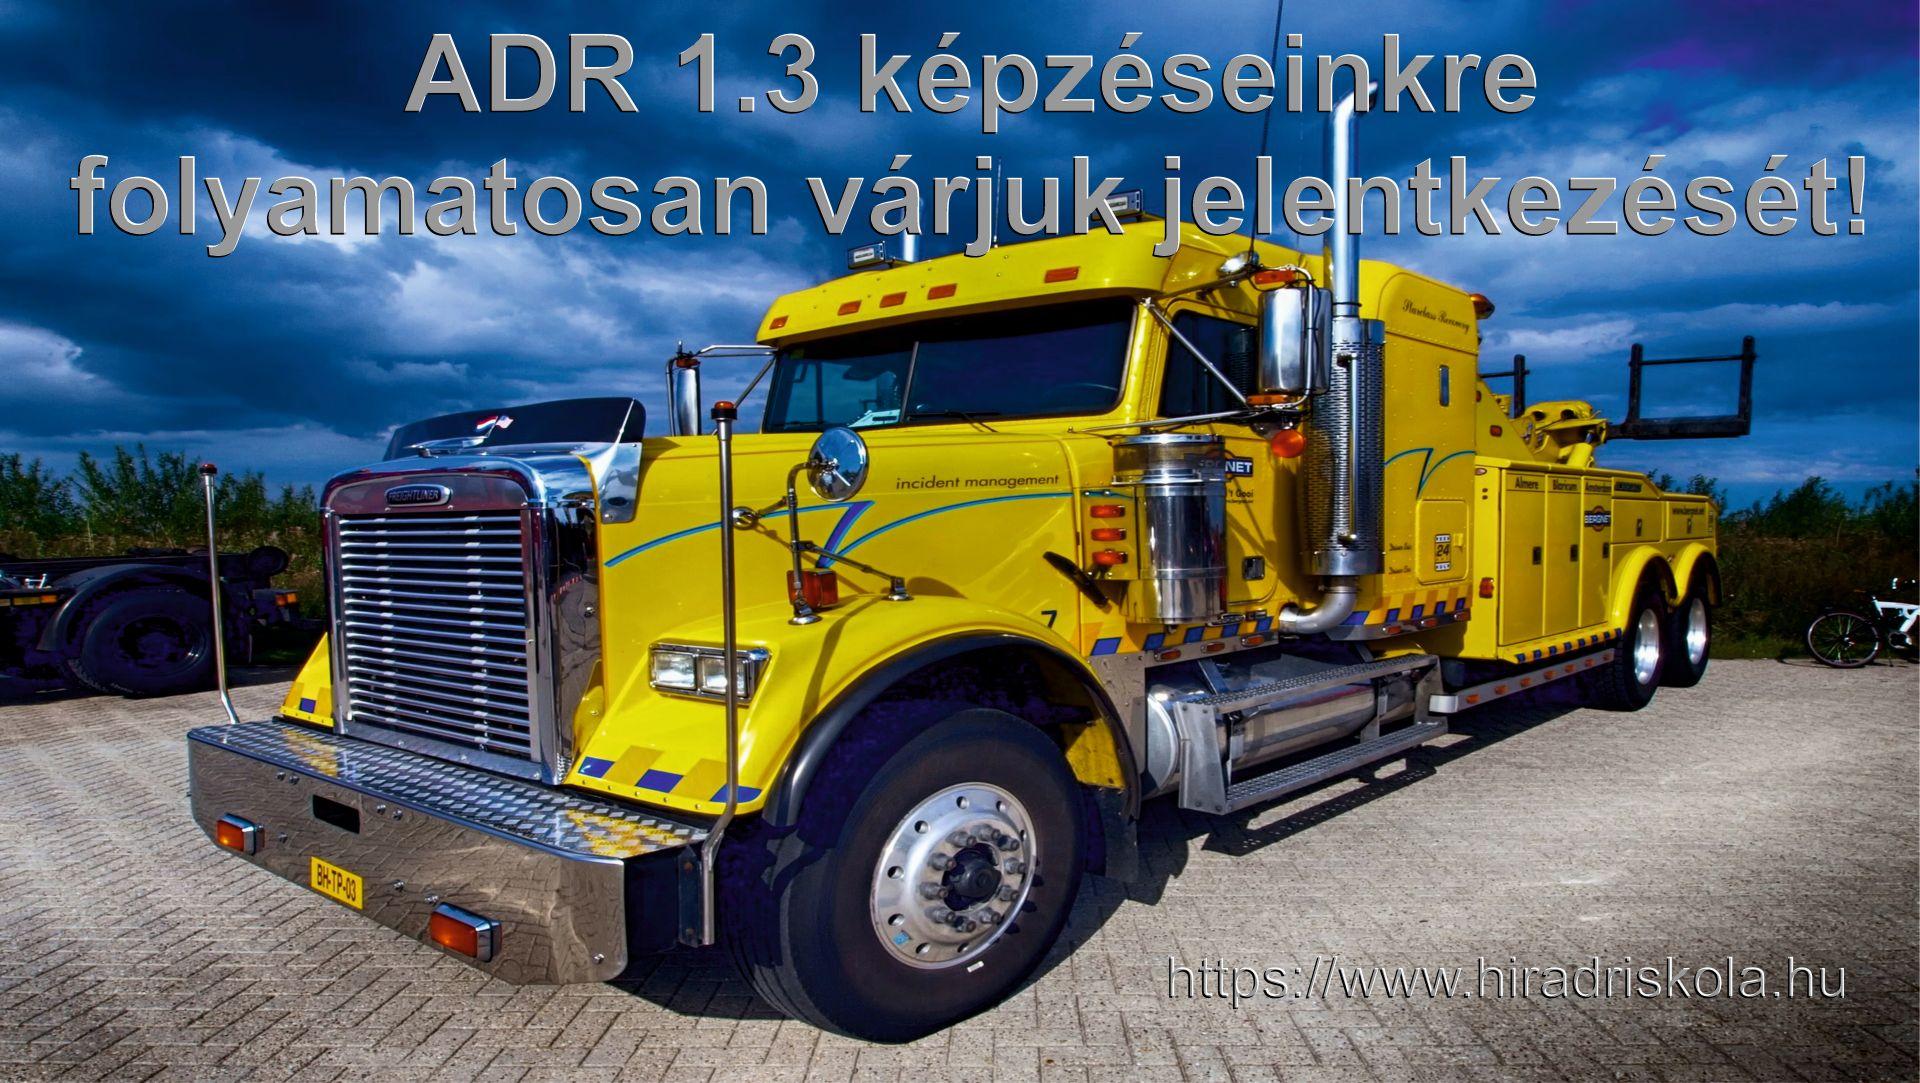 bev-kep-68E3AFDF5-35E4-ABDA-BF9D-8475B12E0F1B.jpg